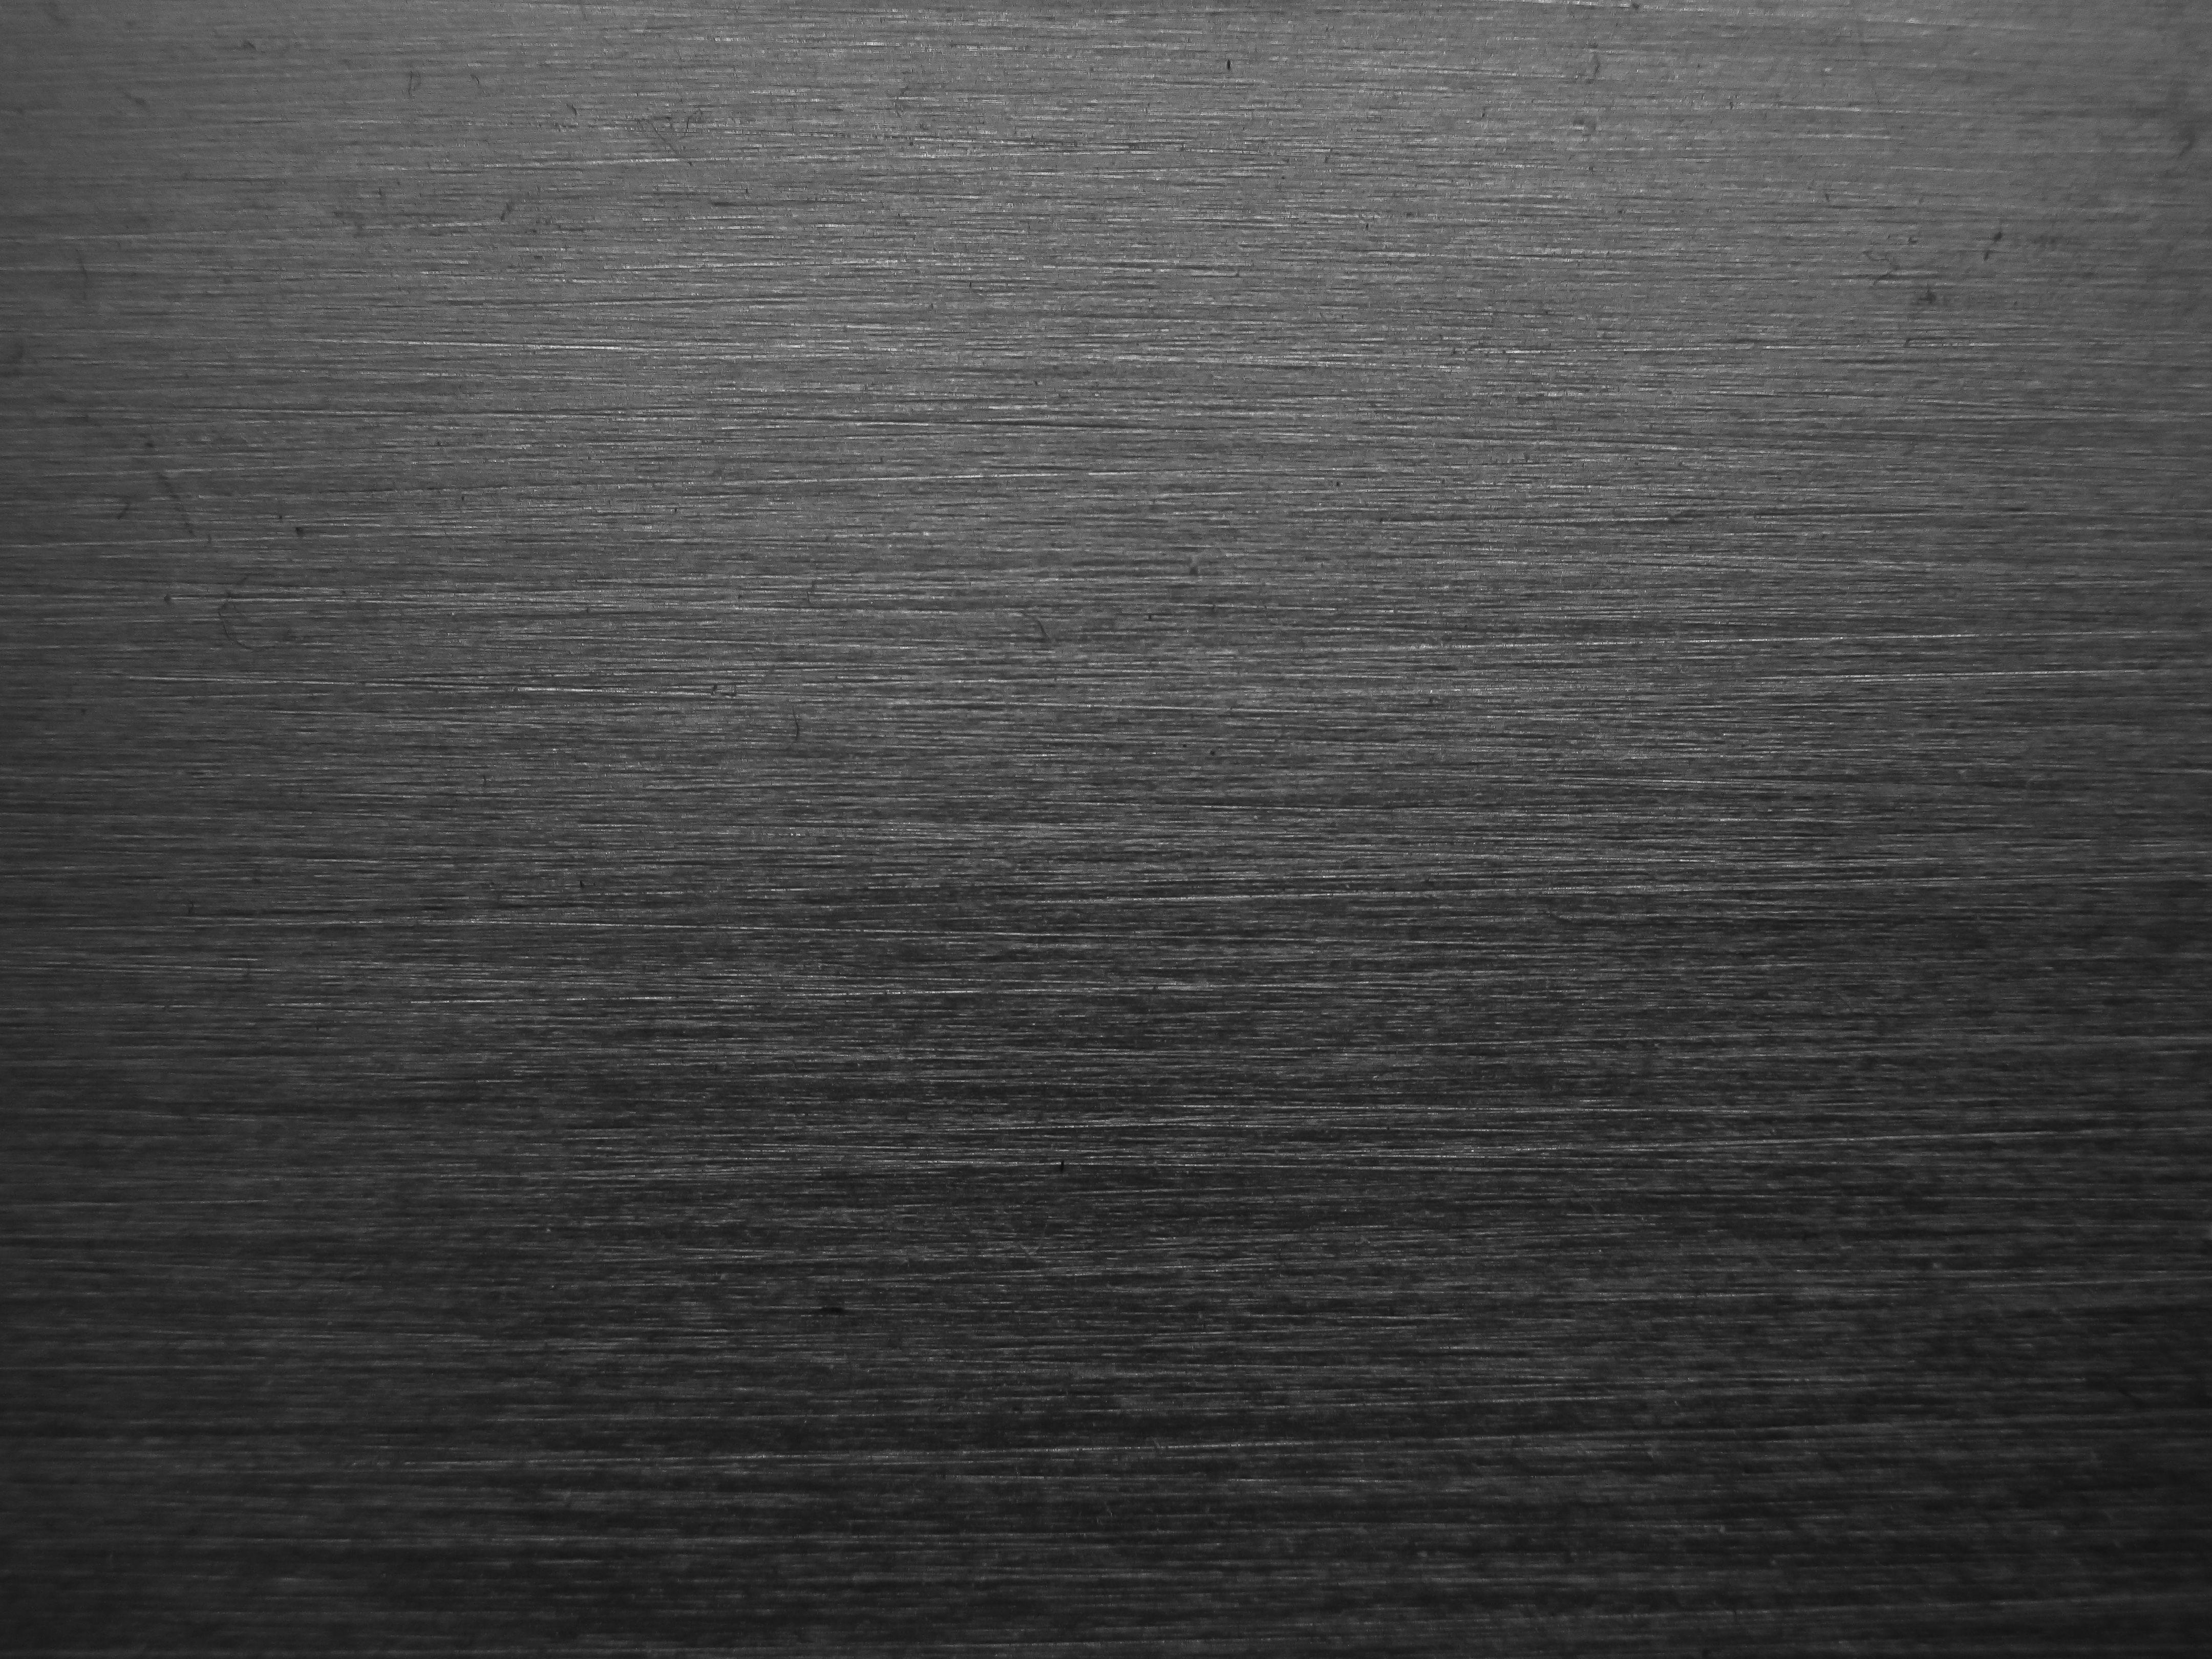 Dark Brushed Metal Texture Steel Stock Photo Colors Grey Desain